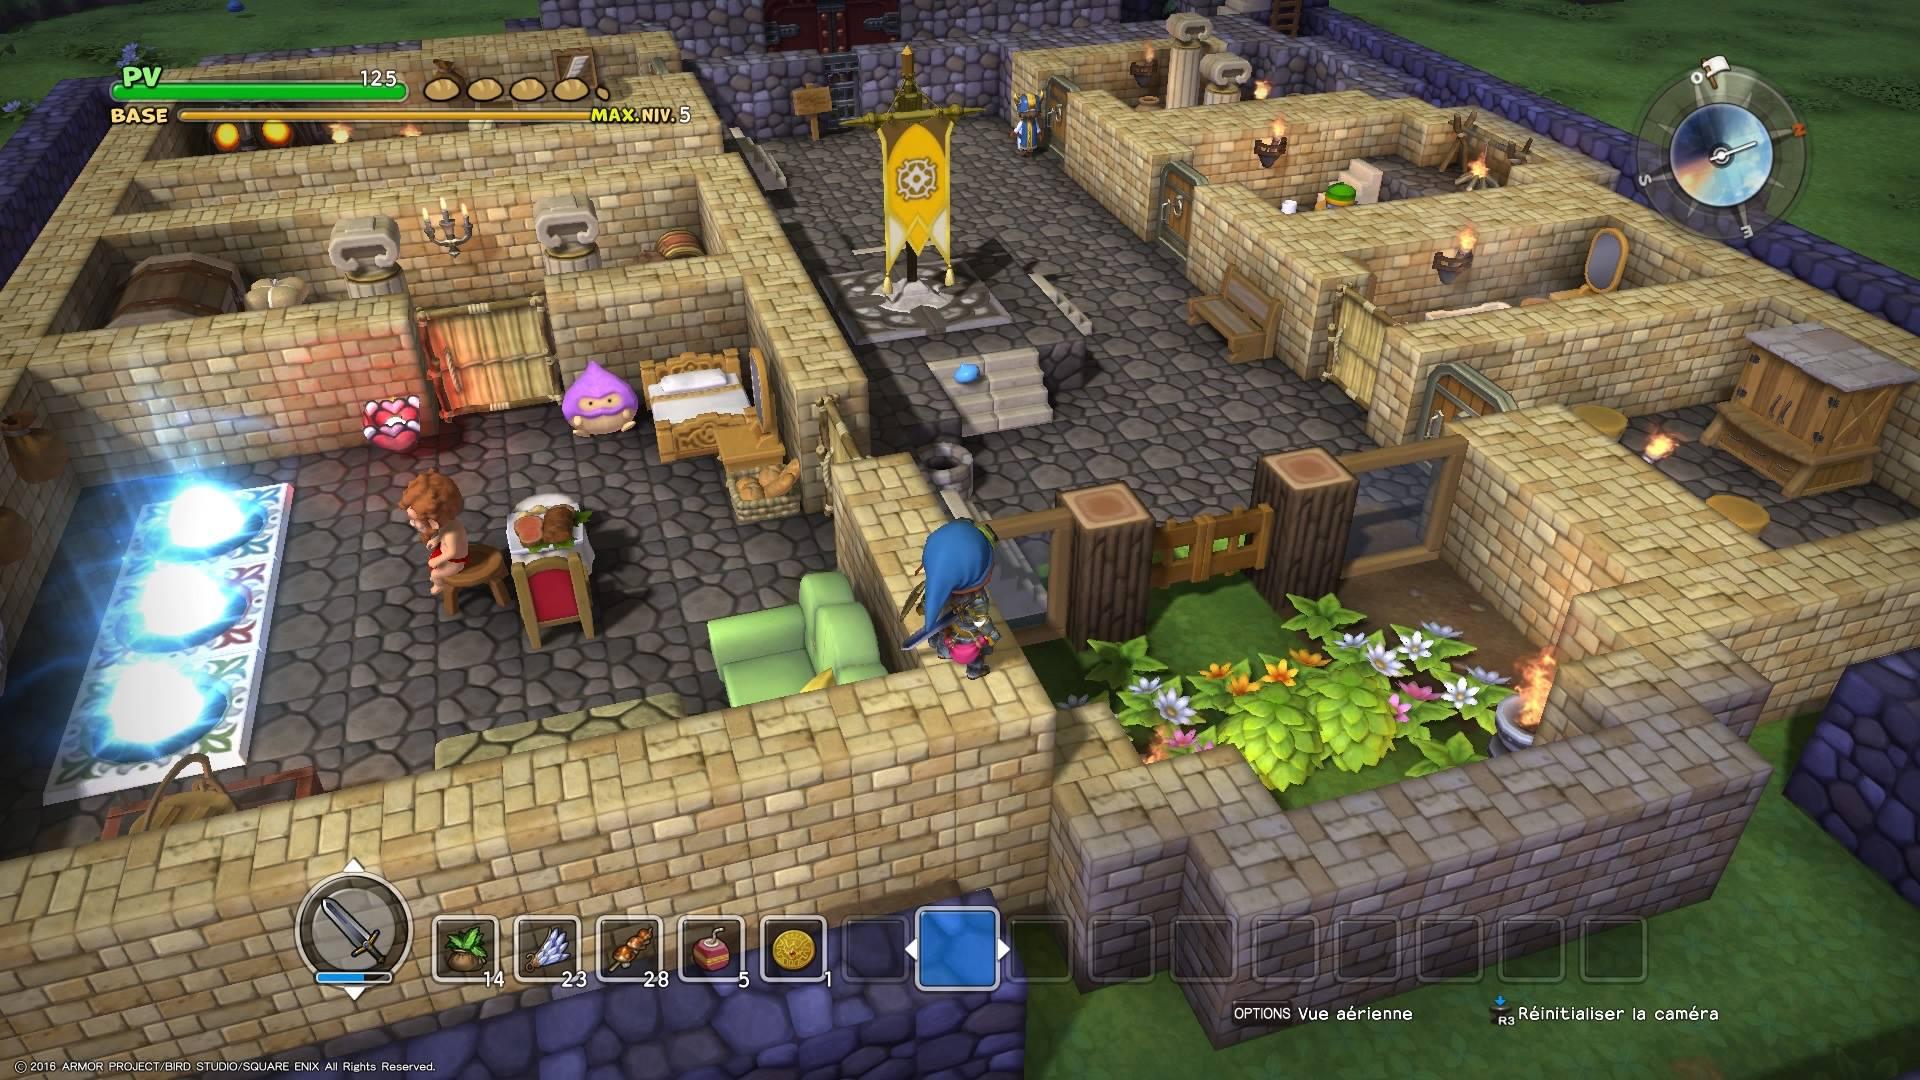 Cantelin Dragon Quest Builder